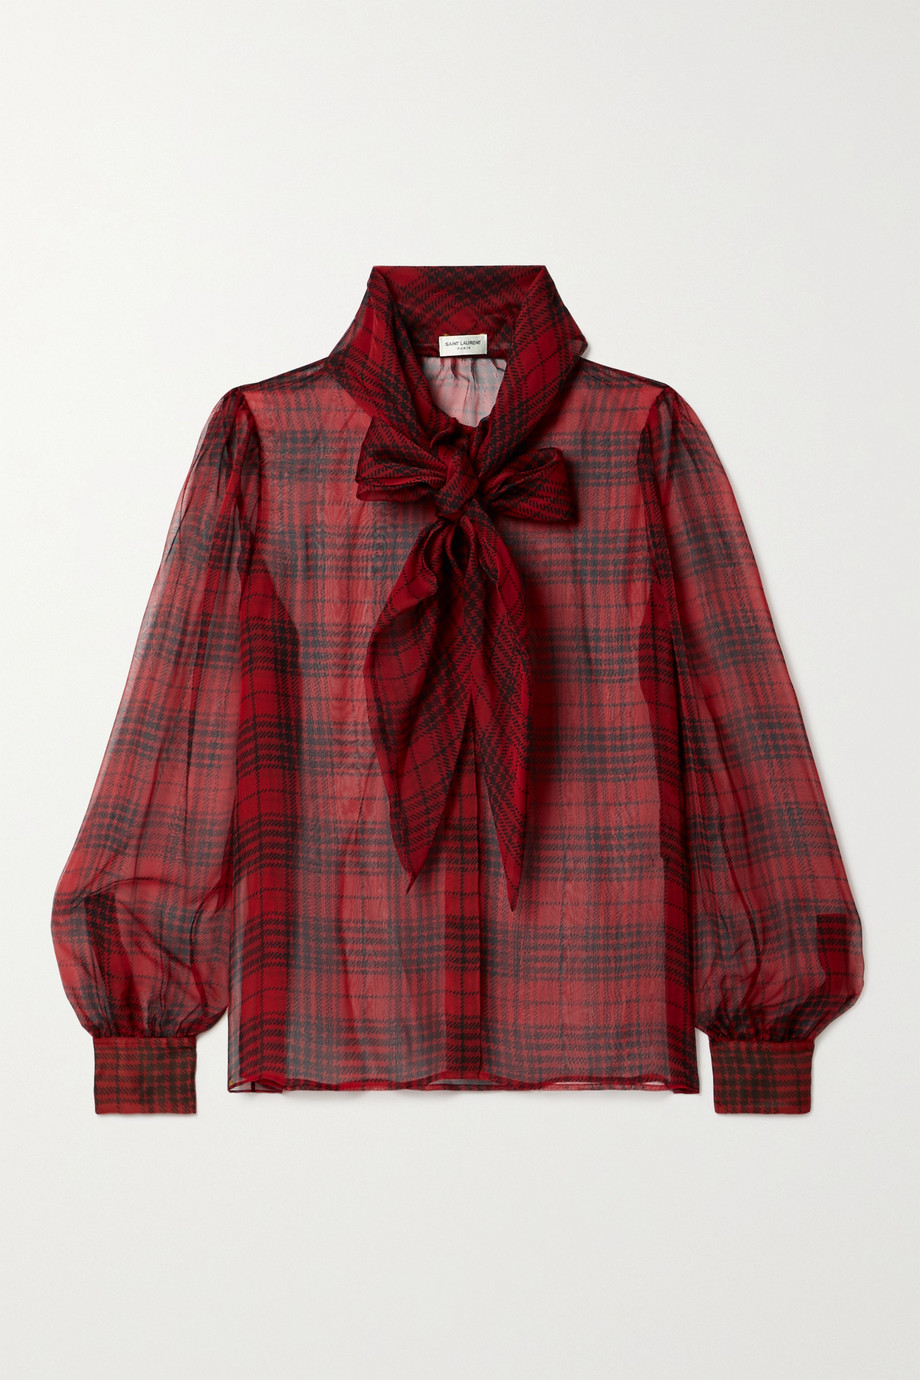 SAINT LAURENT Pussy-bow checked silk-chiffon blouse